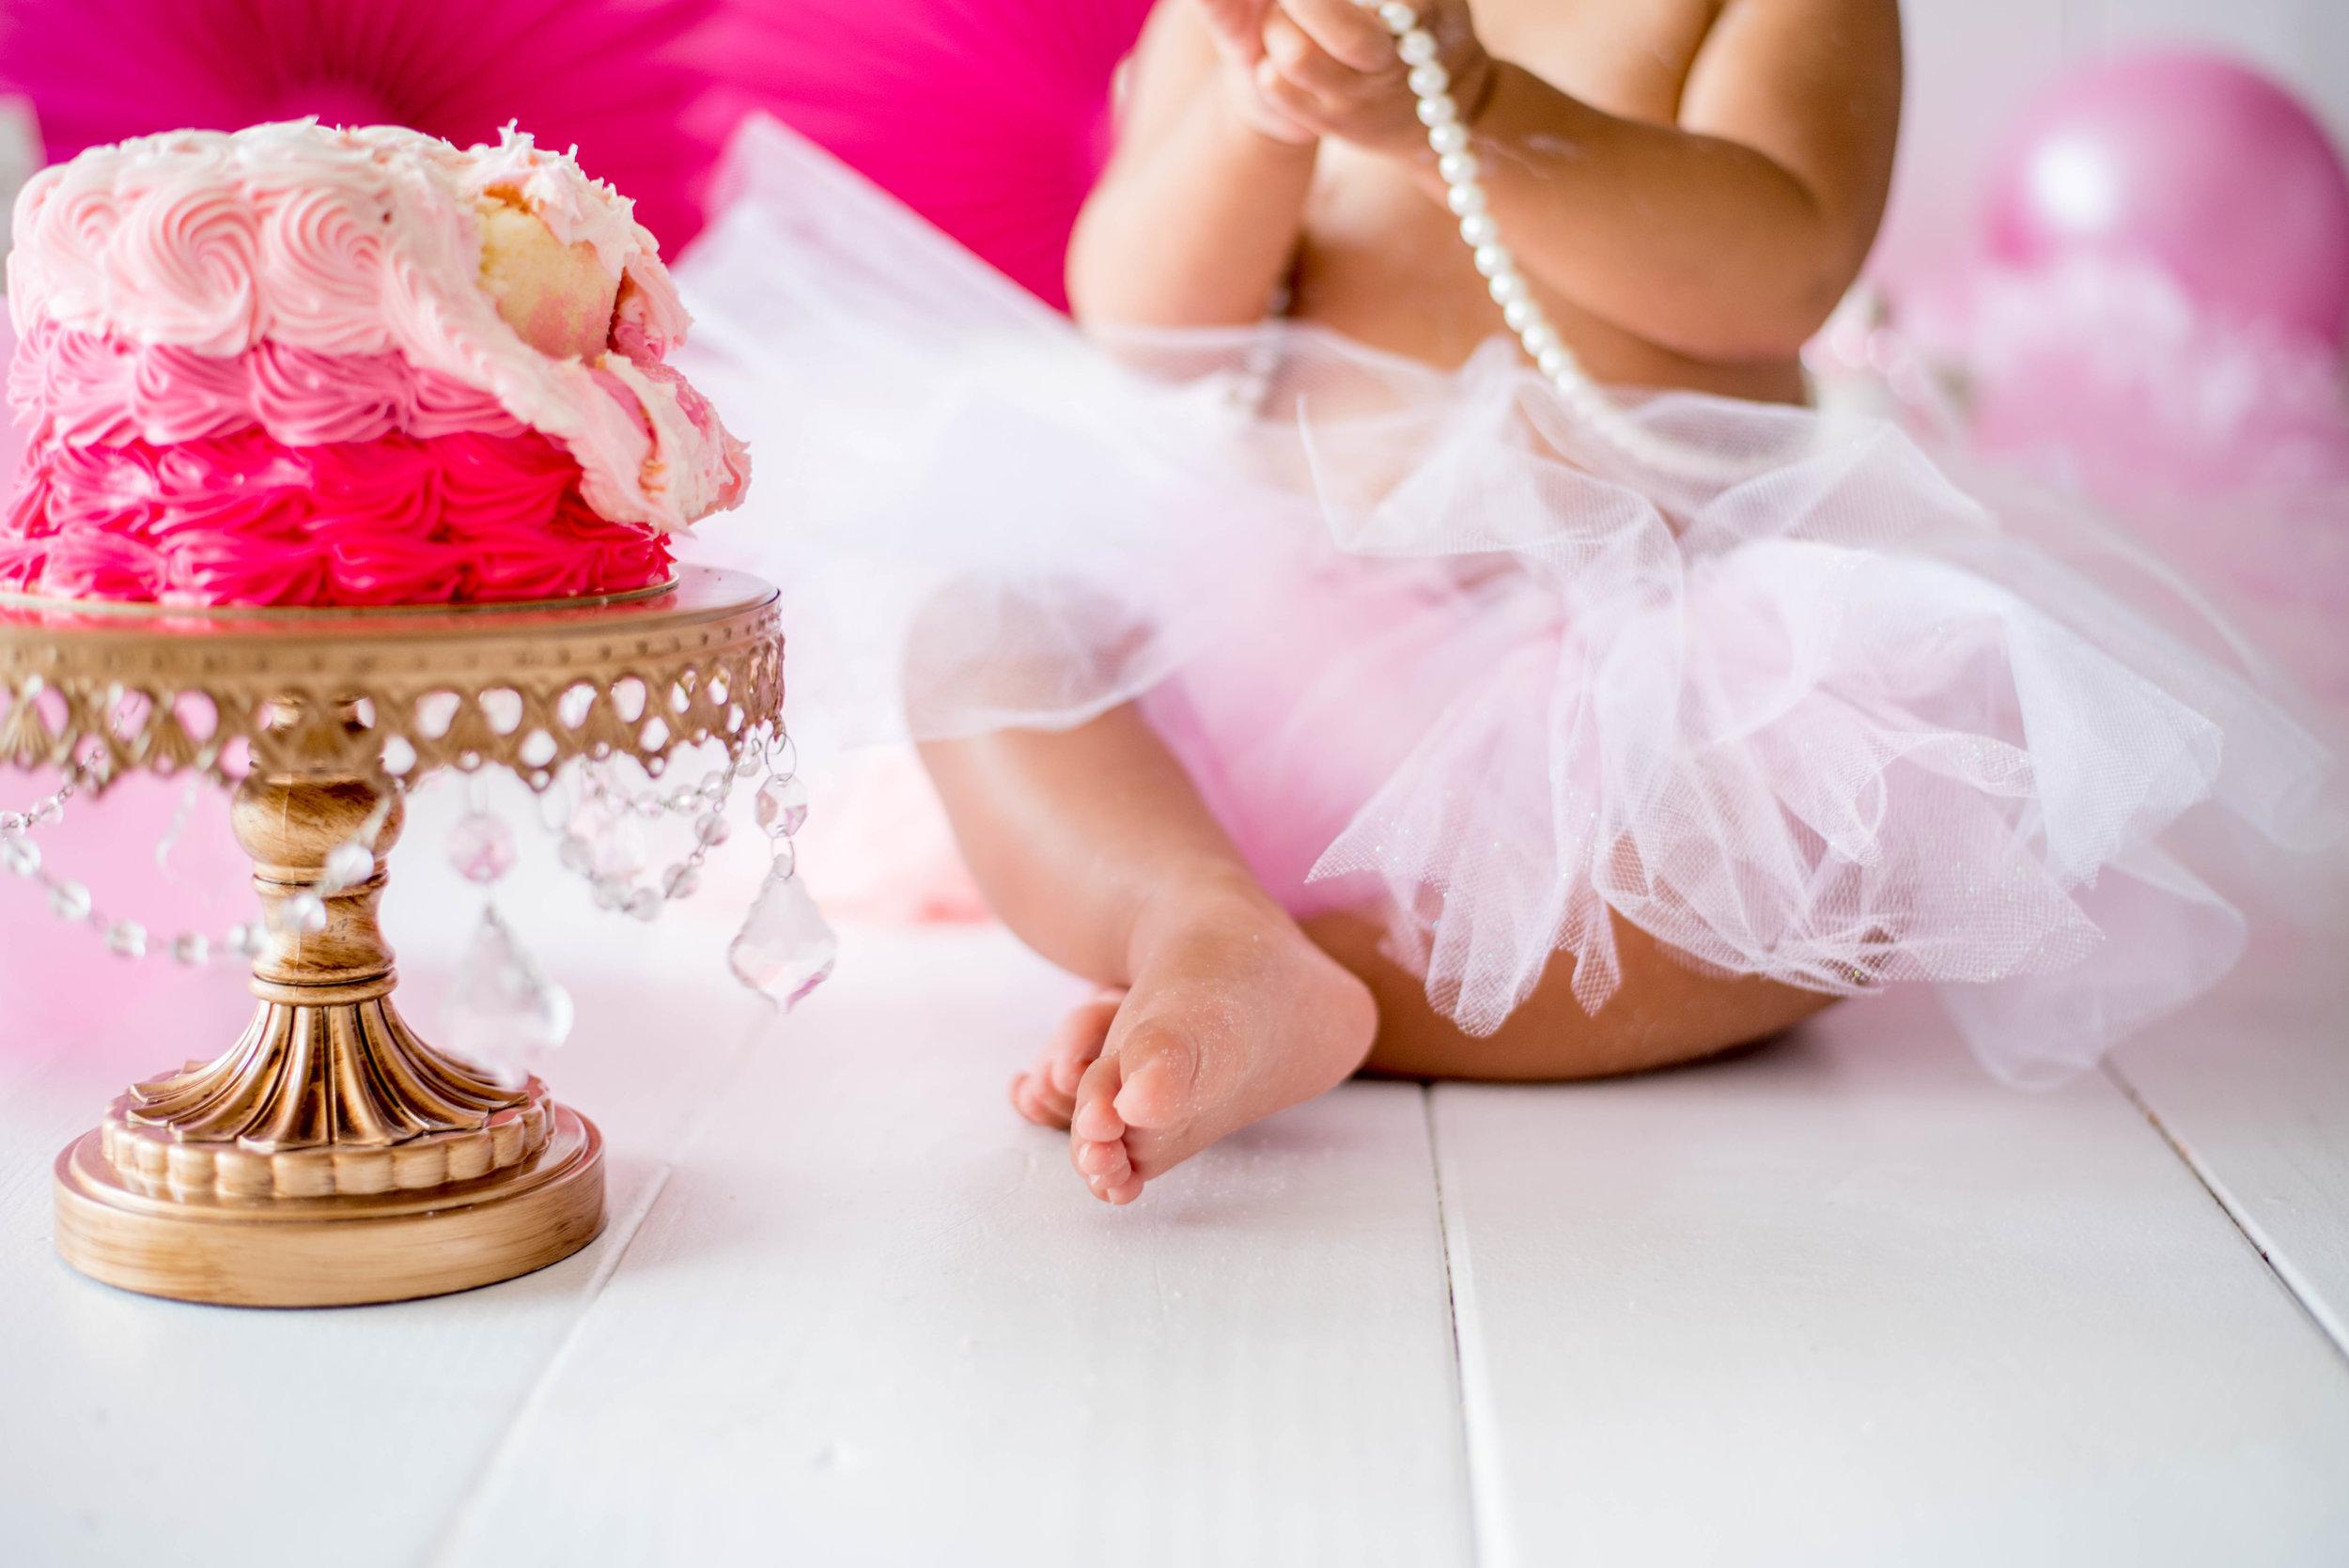 Baby Girl Cake Smash